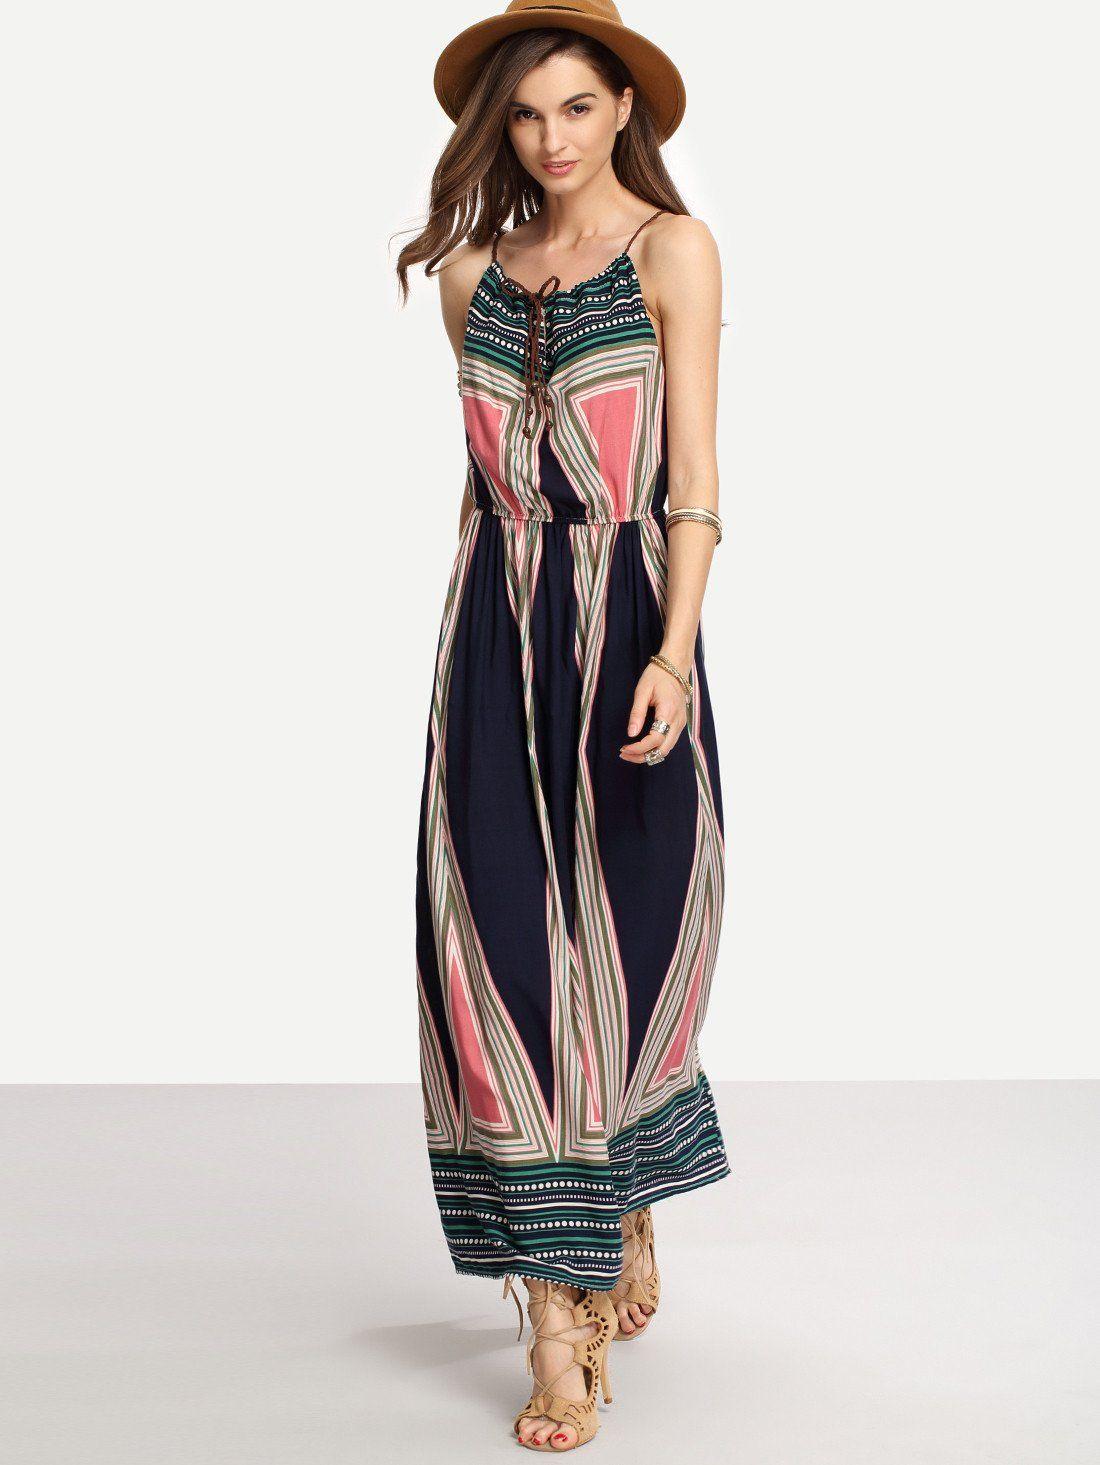 efc7672b68 Petalsfashionz.com Quick shipping low prices women's maxi dresses & sun  dresses Brand